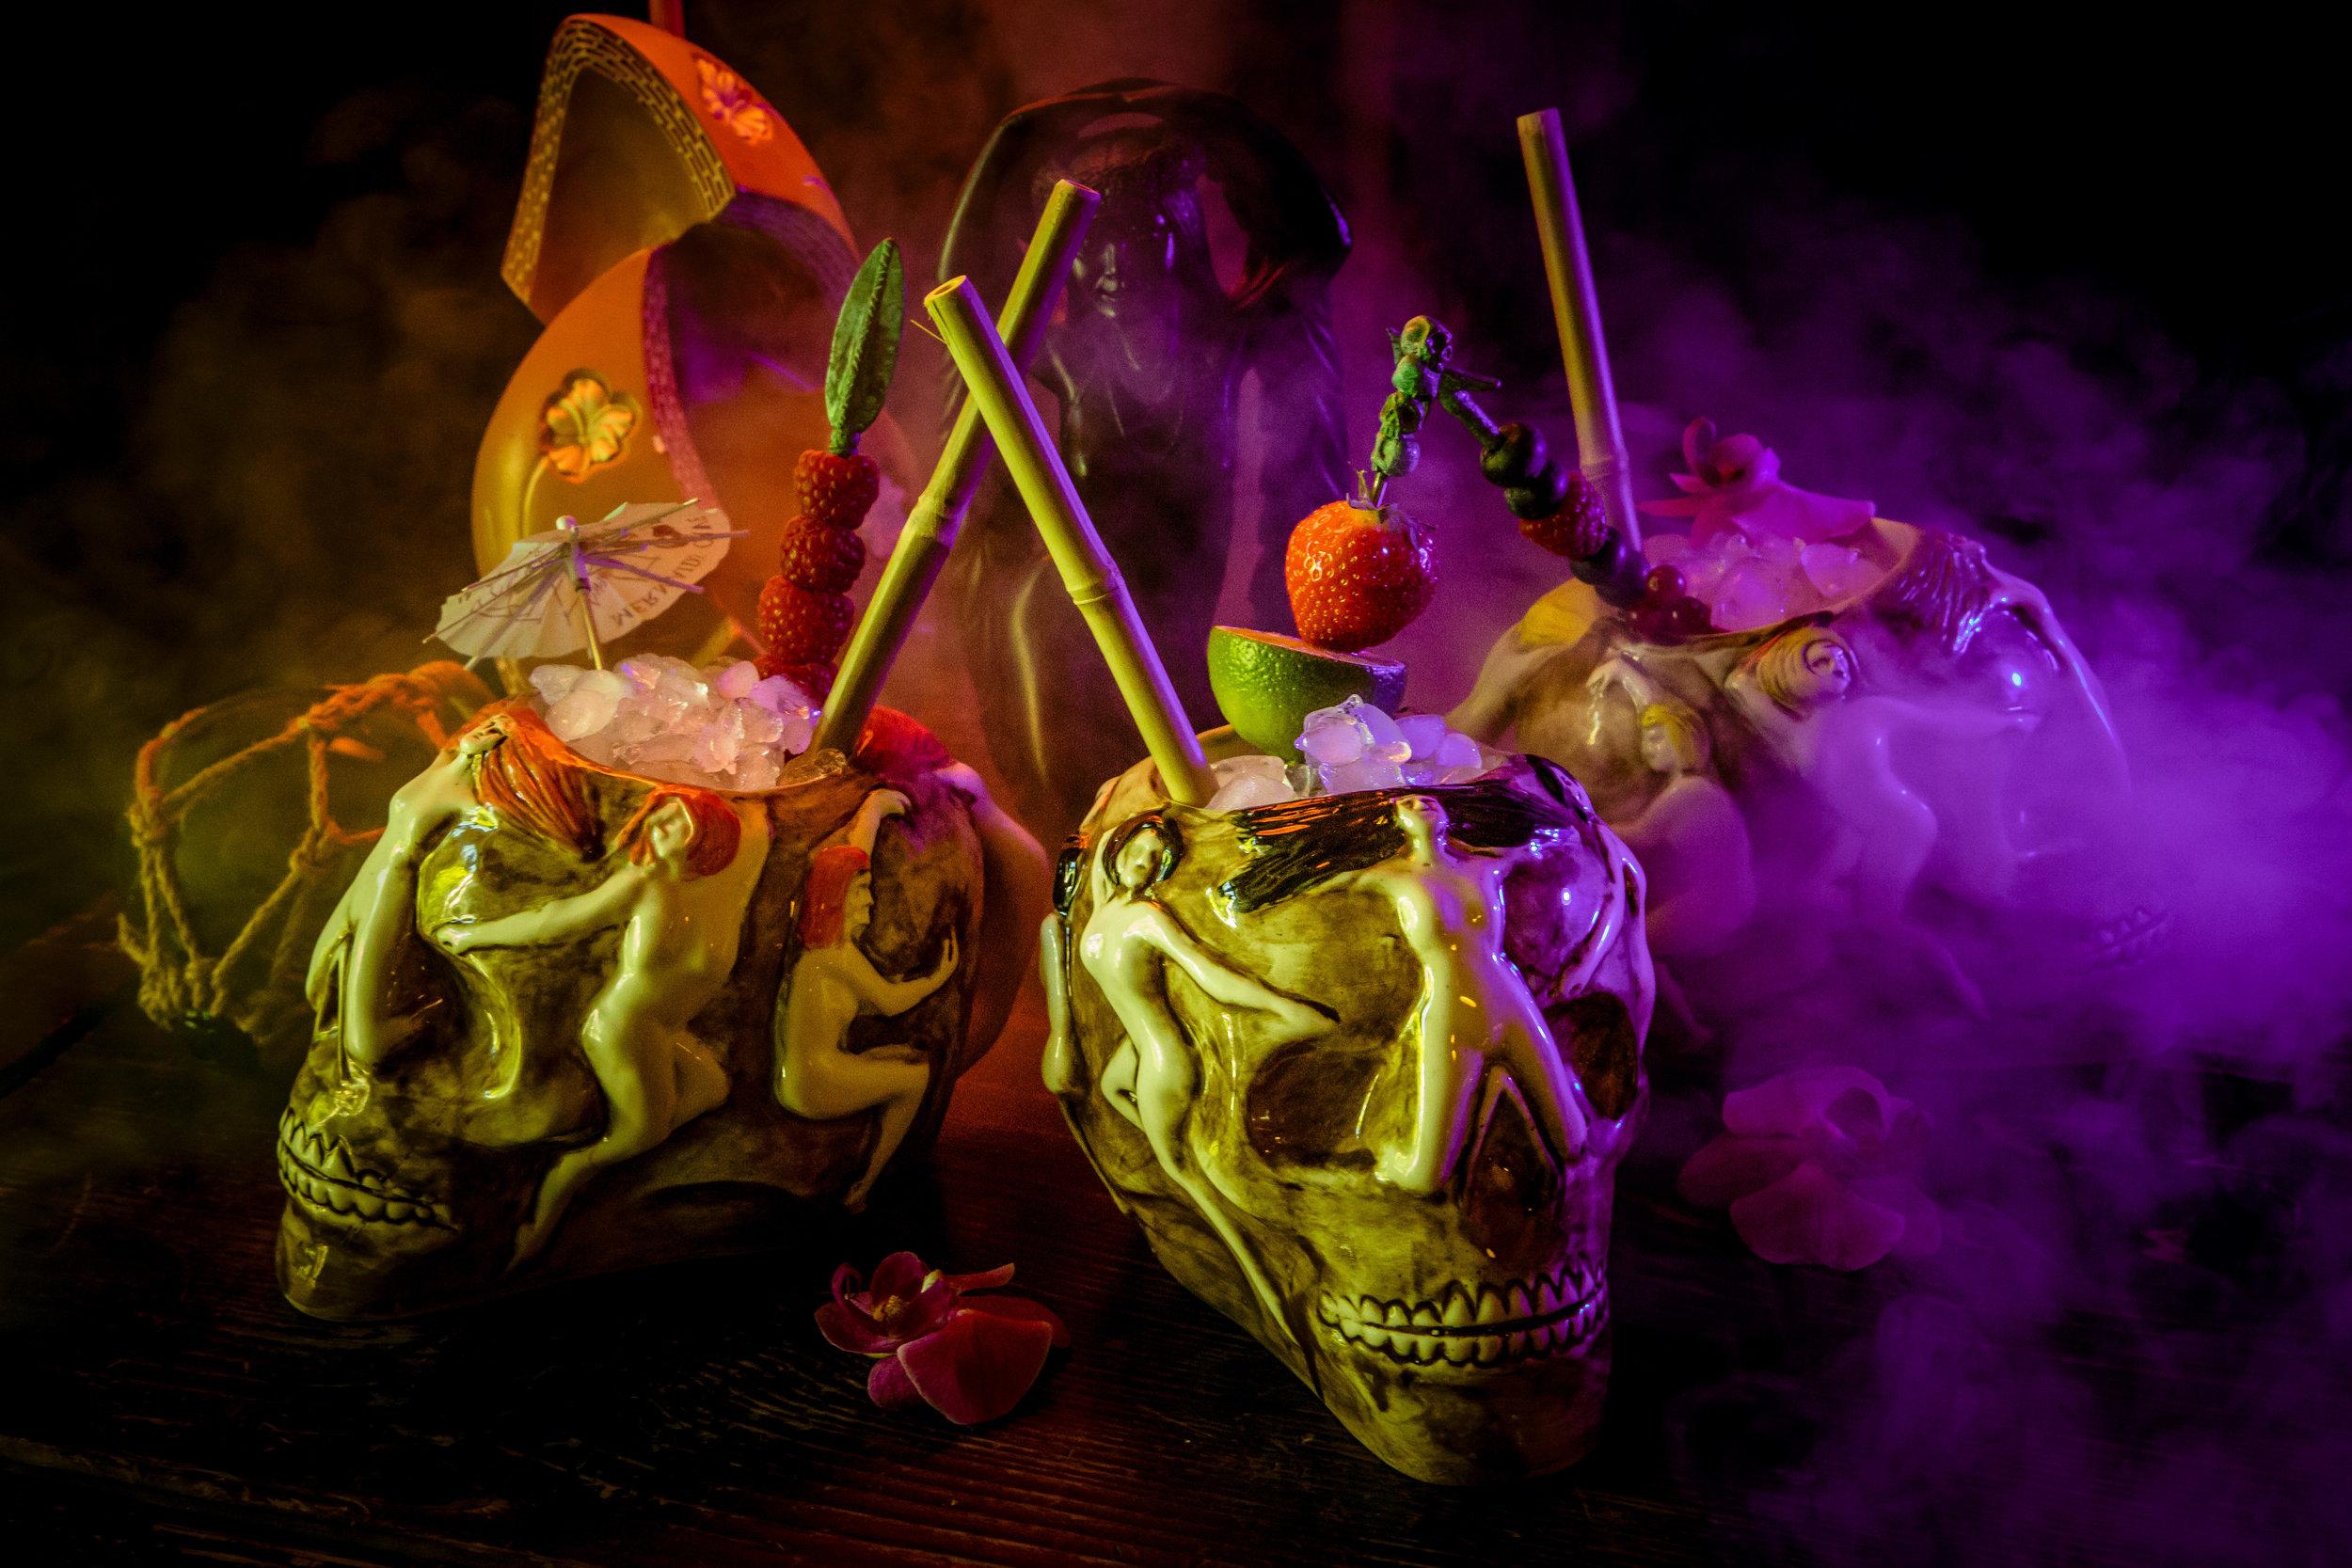 Hurricane Skull Set | Crypotikimugs 2019 by Dirk Behlau-1188.jpg